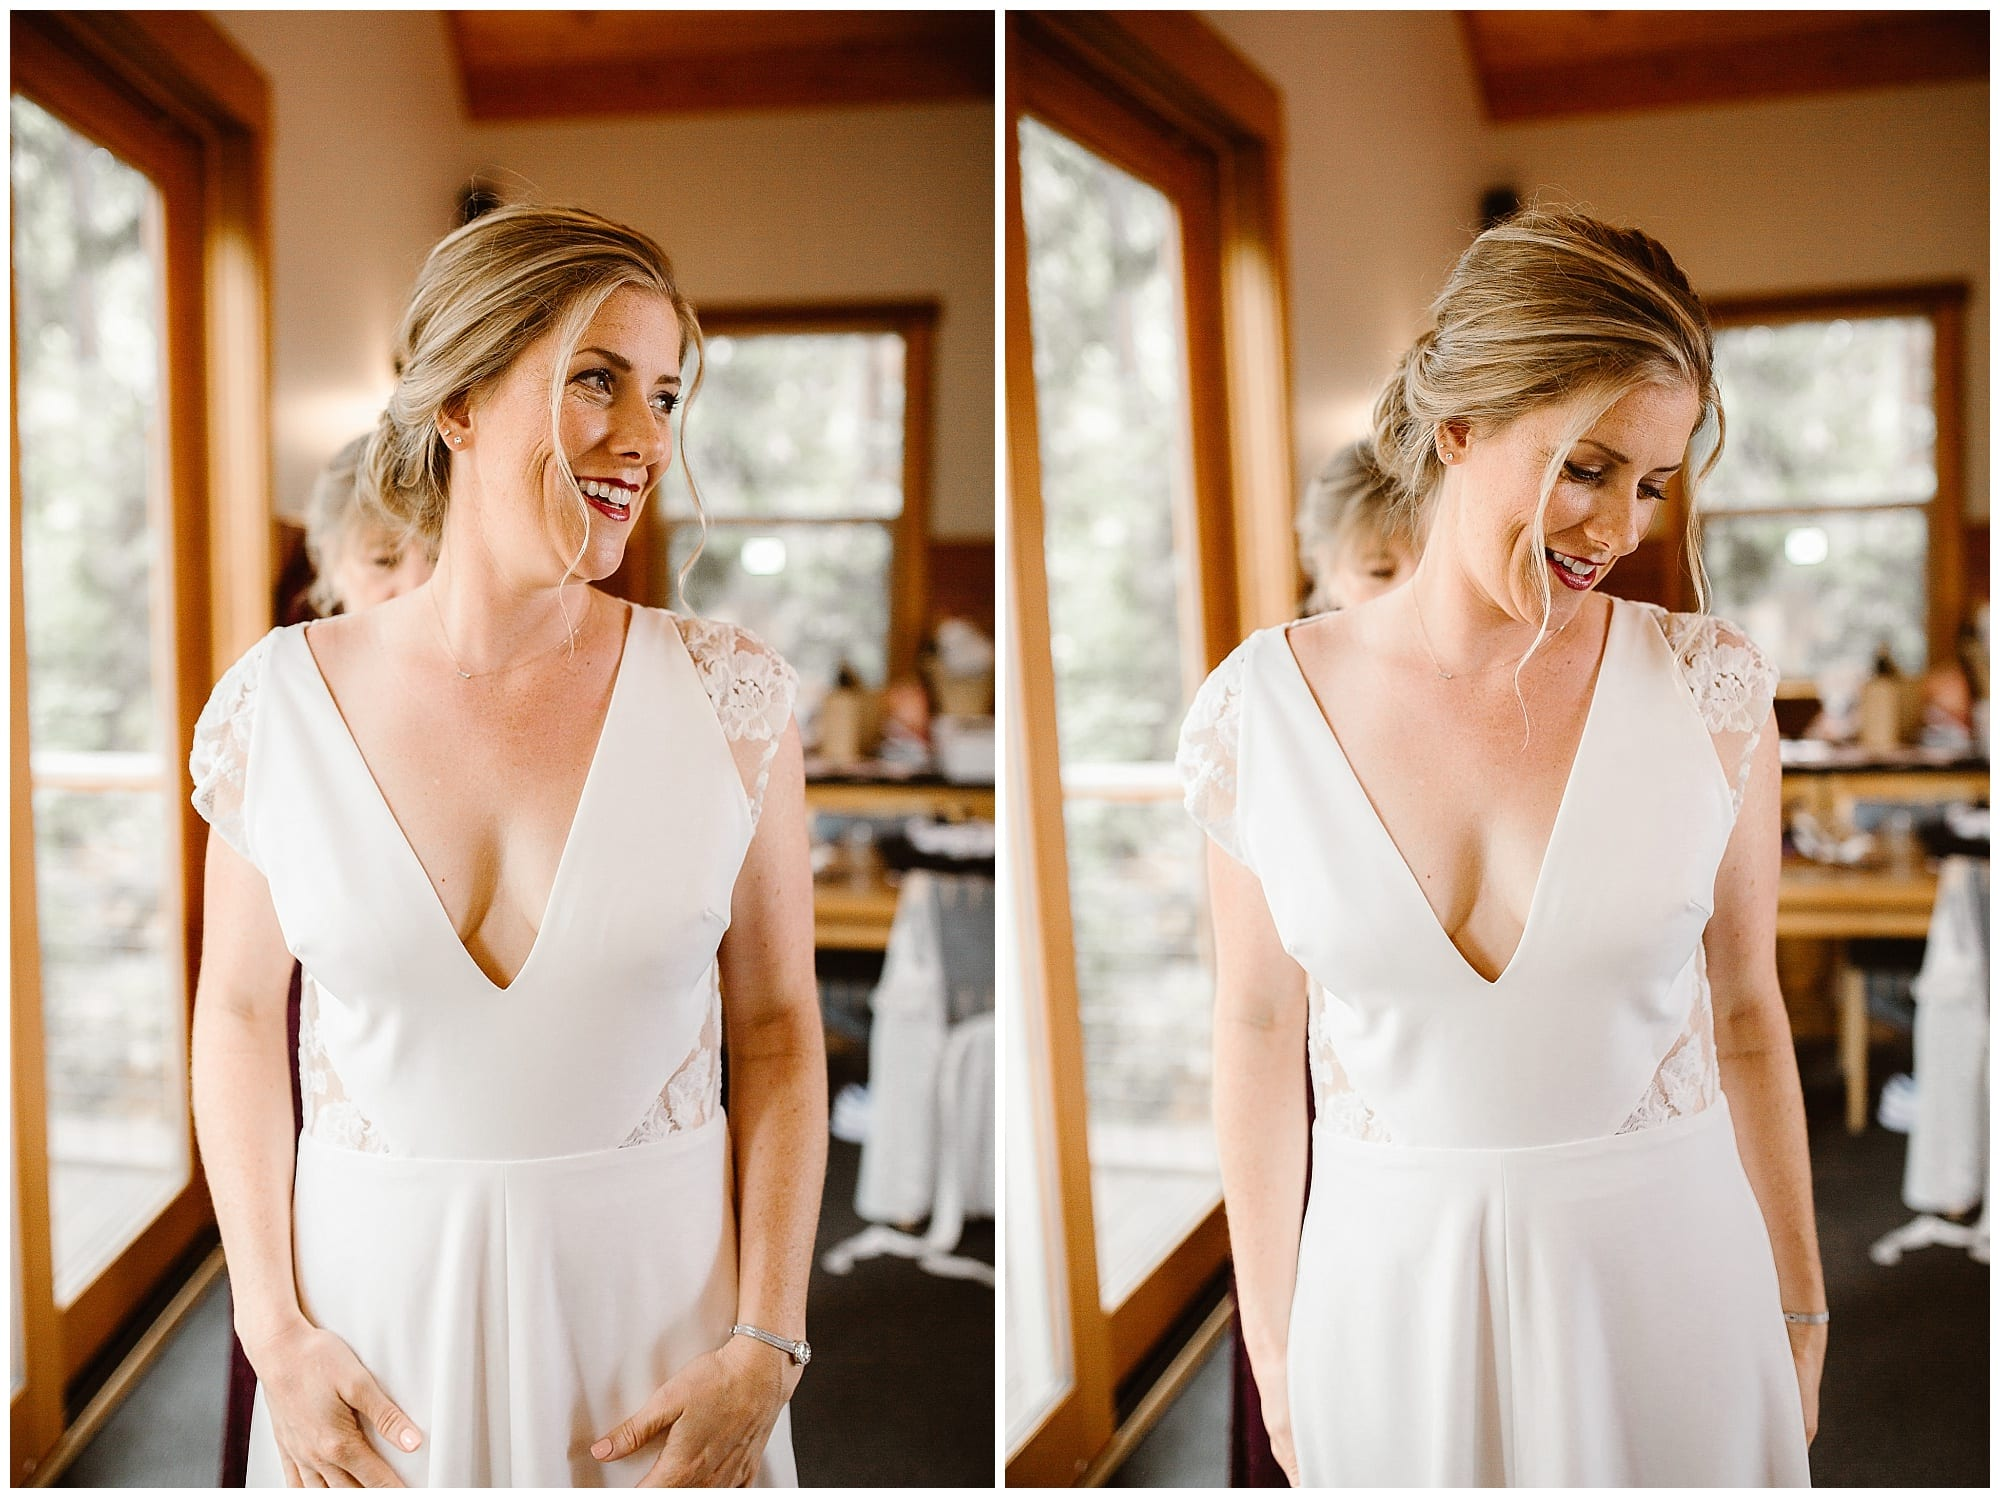 bride getting dressed in wedding dress